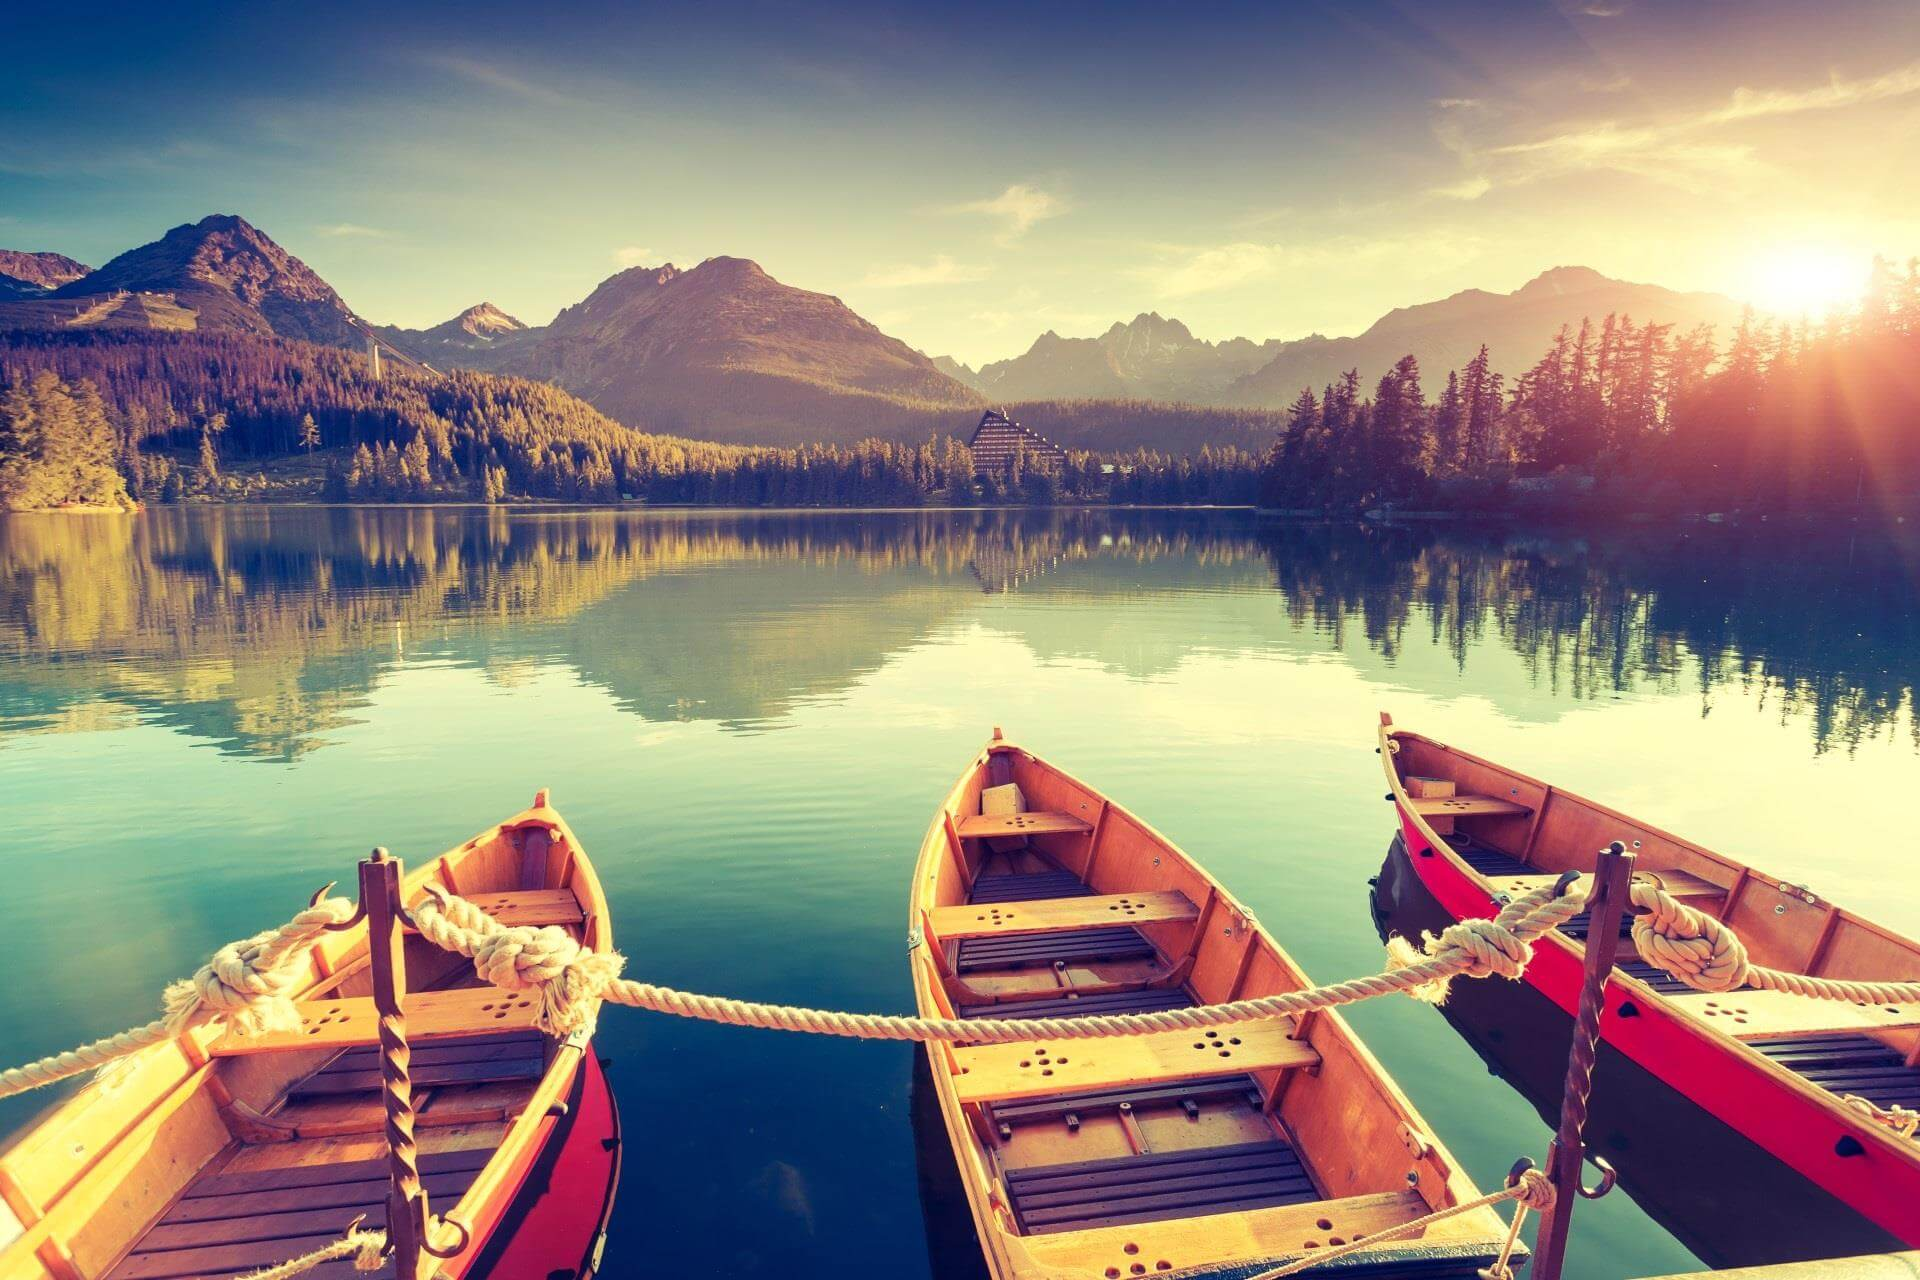 three boats, water, hills, trees